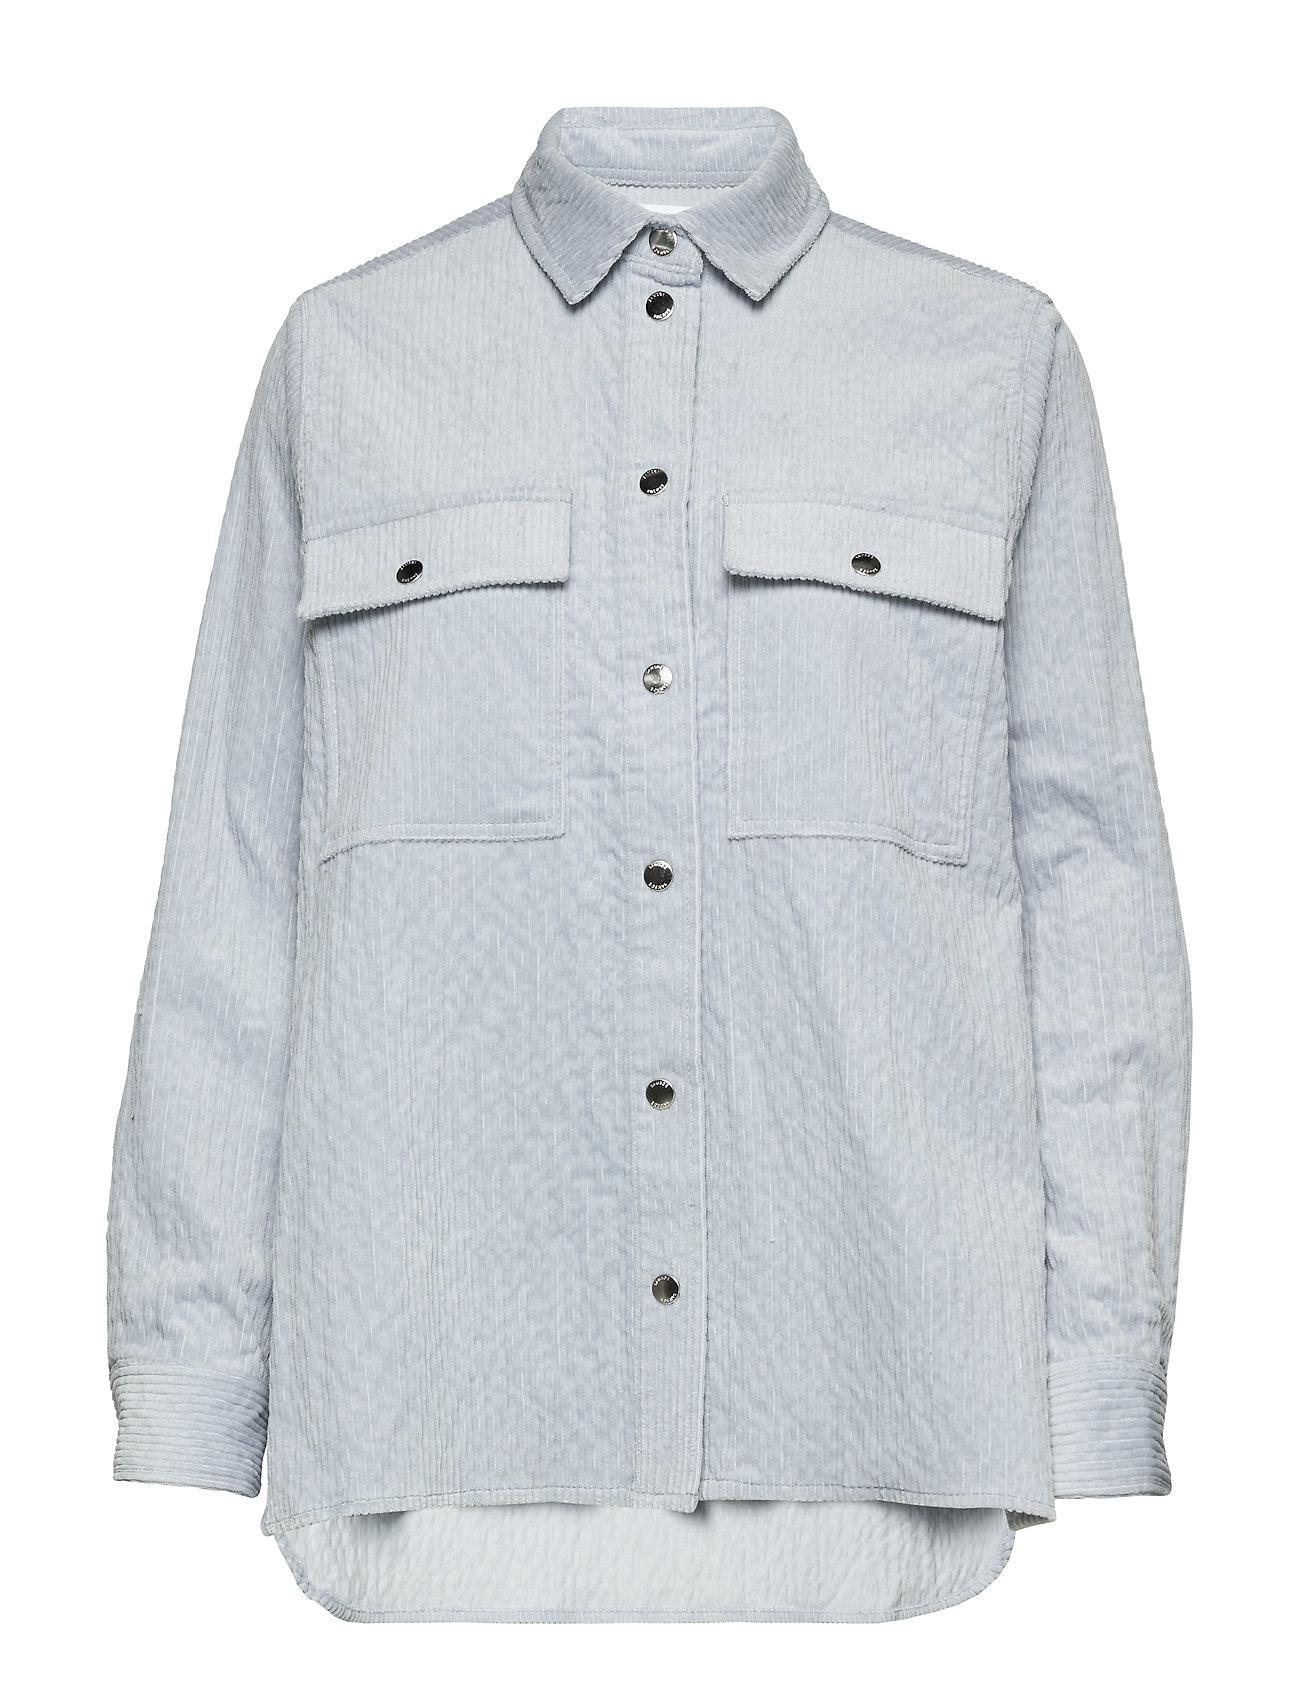 Samsøe & Samsøe Leonora shirt 11305 - ZEN BLUE